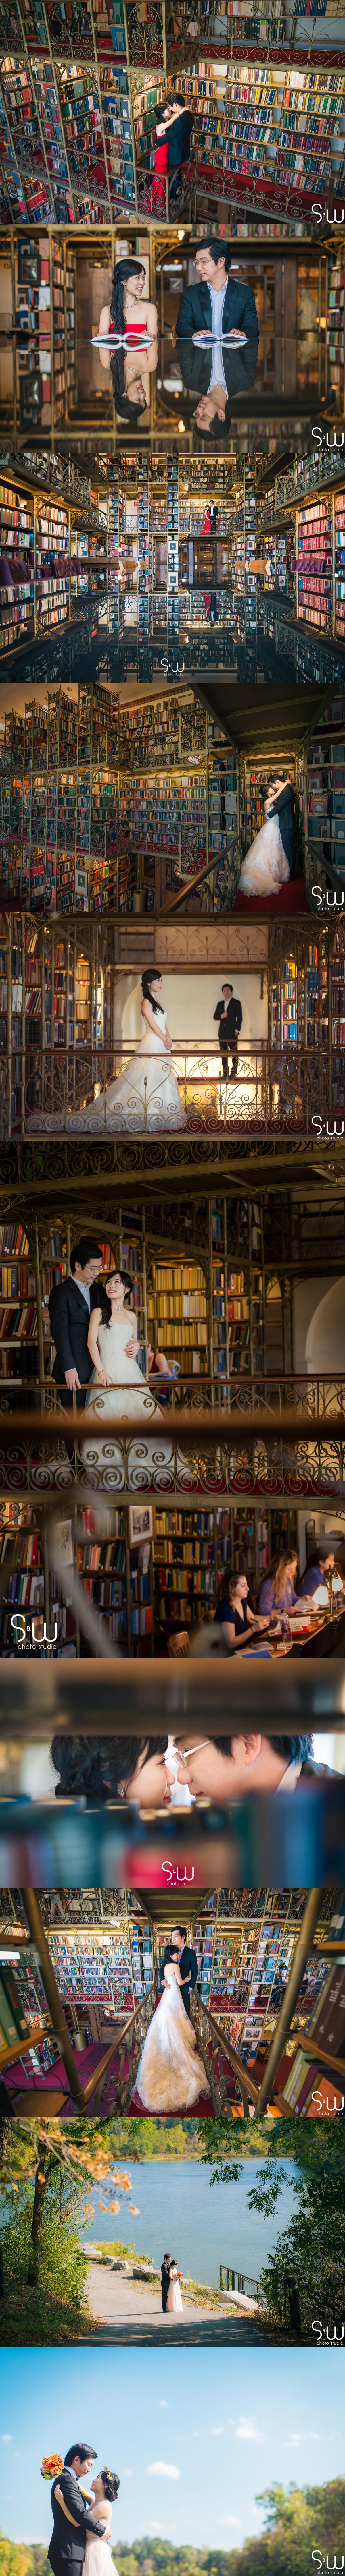 PRE WEDDING | Cornell,New York (紐約康奈爾婚紗) | sw photo studio 婚禮, 婚攝, 婚紗, 海外婚禮, 海外婚紗, 海島婚禮,峇里島婚禮, 峇里島婚紗, 台灣婚禮, 婚攝推薦